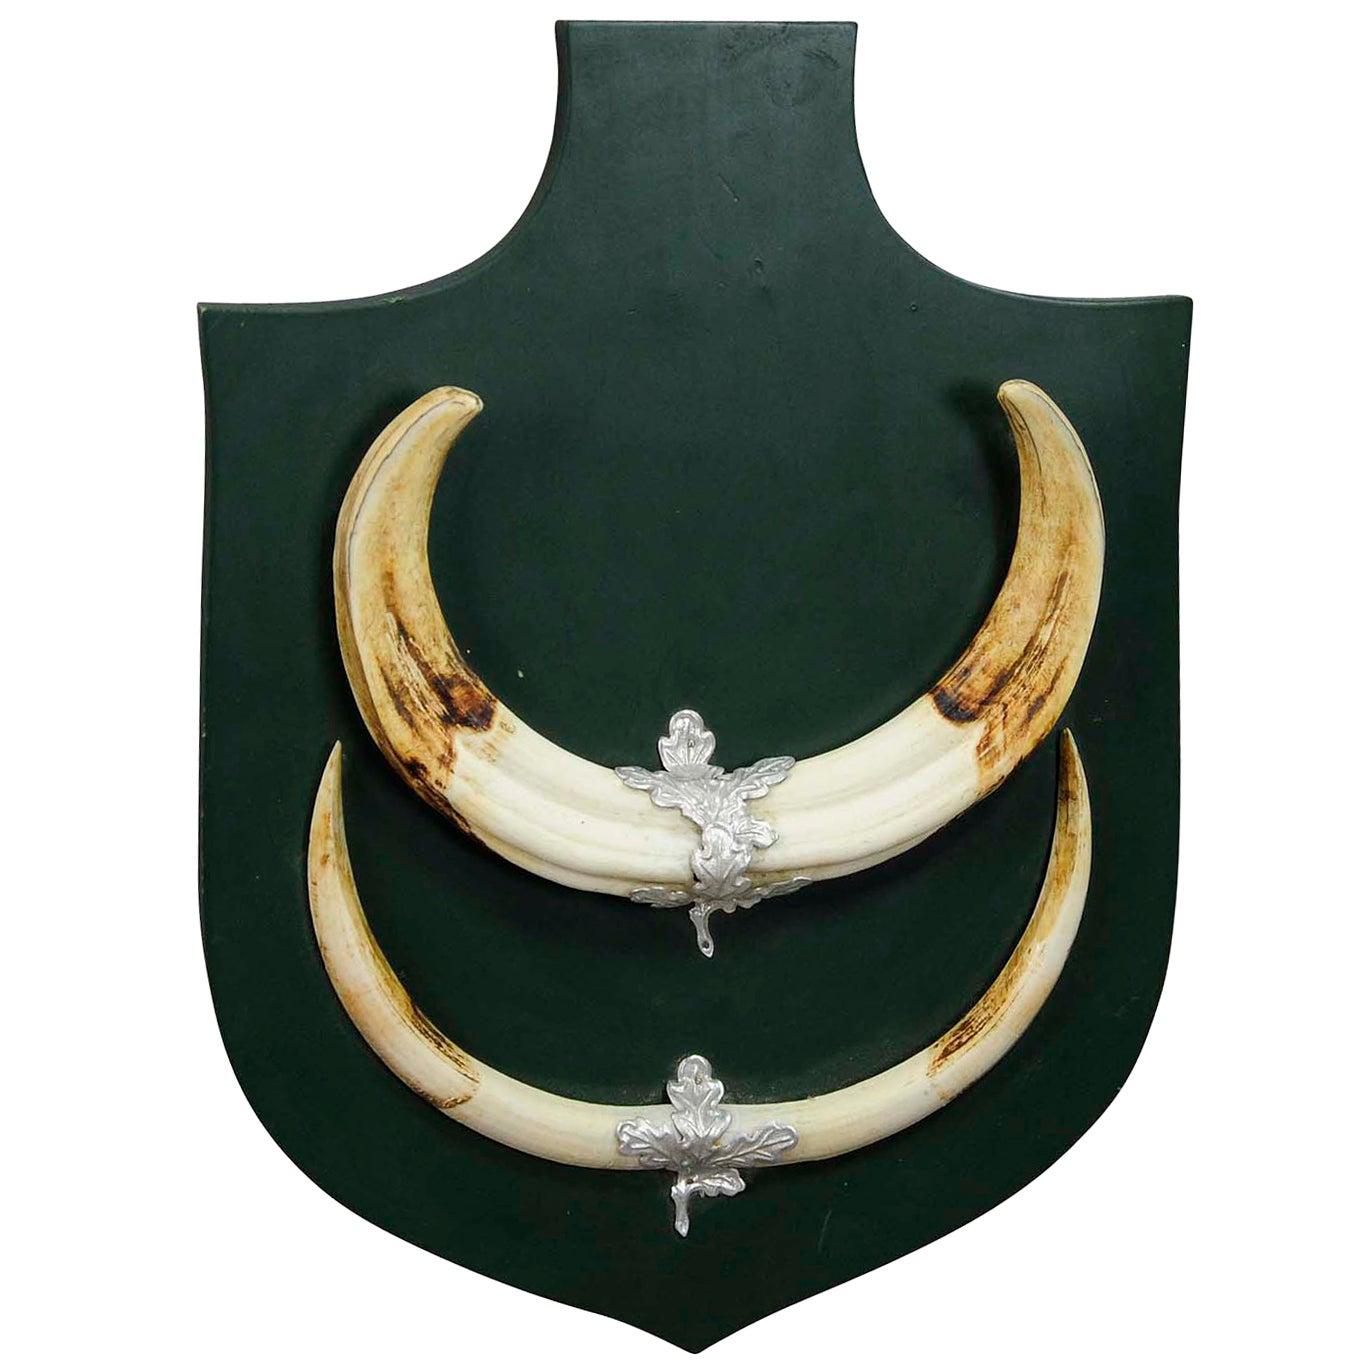 Great African Wart Hog Trophy Mount on Wooden Plaque